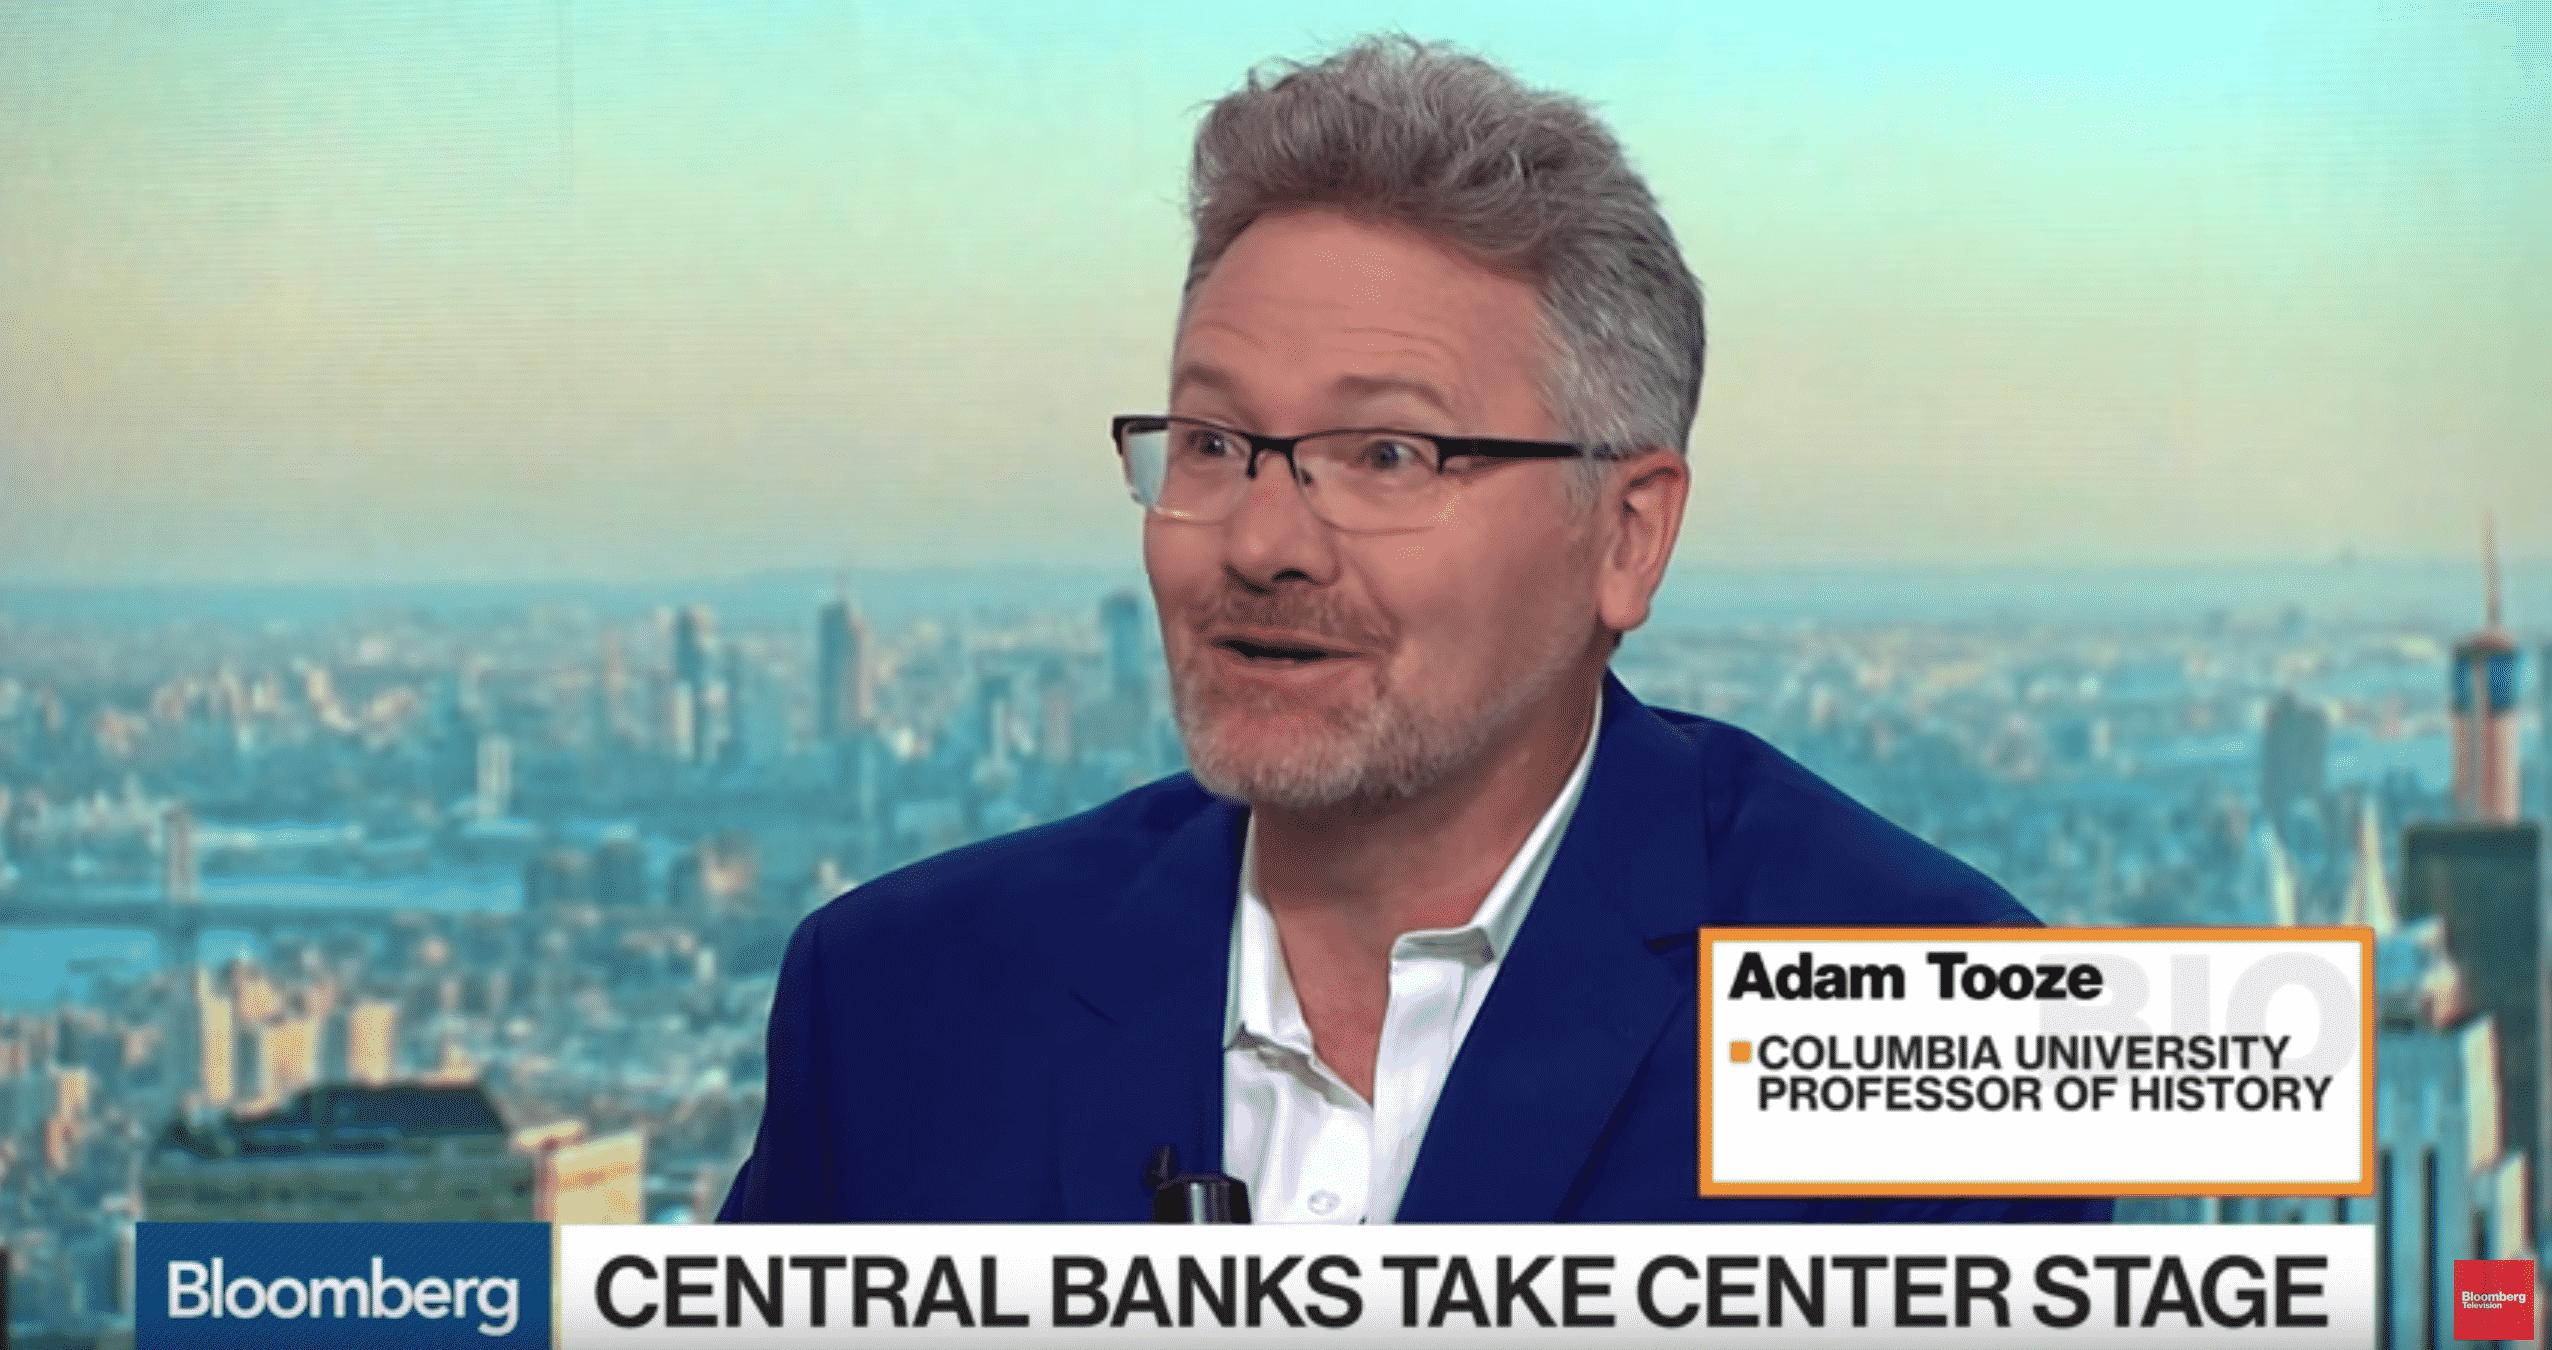 Adam Tooze talking on Bloomberg